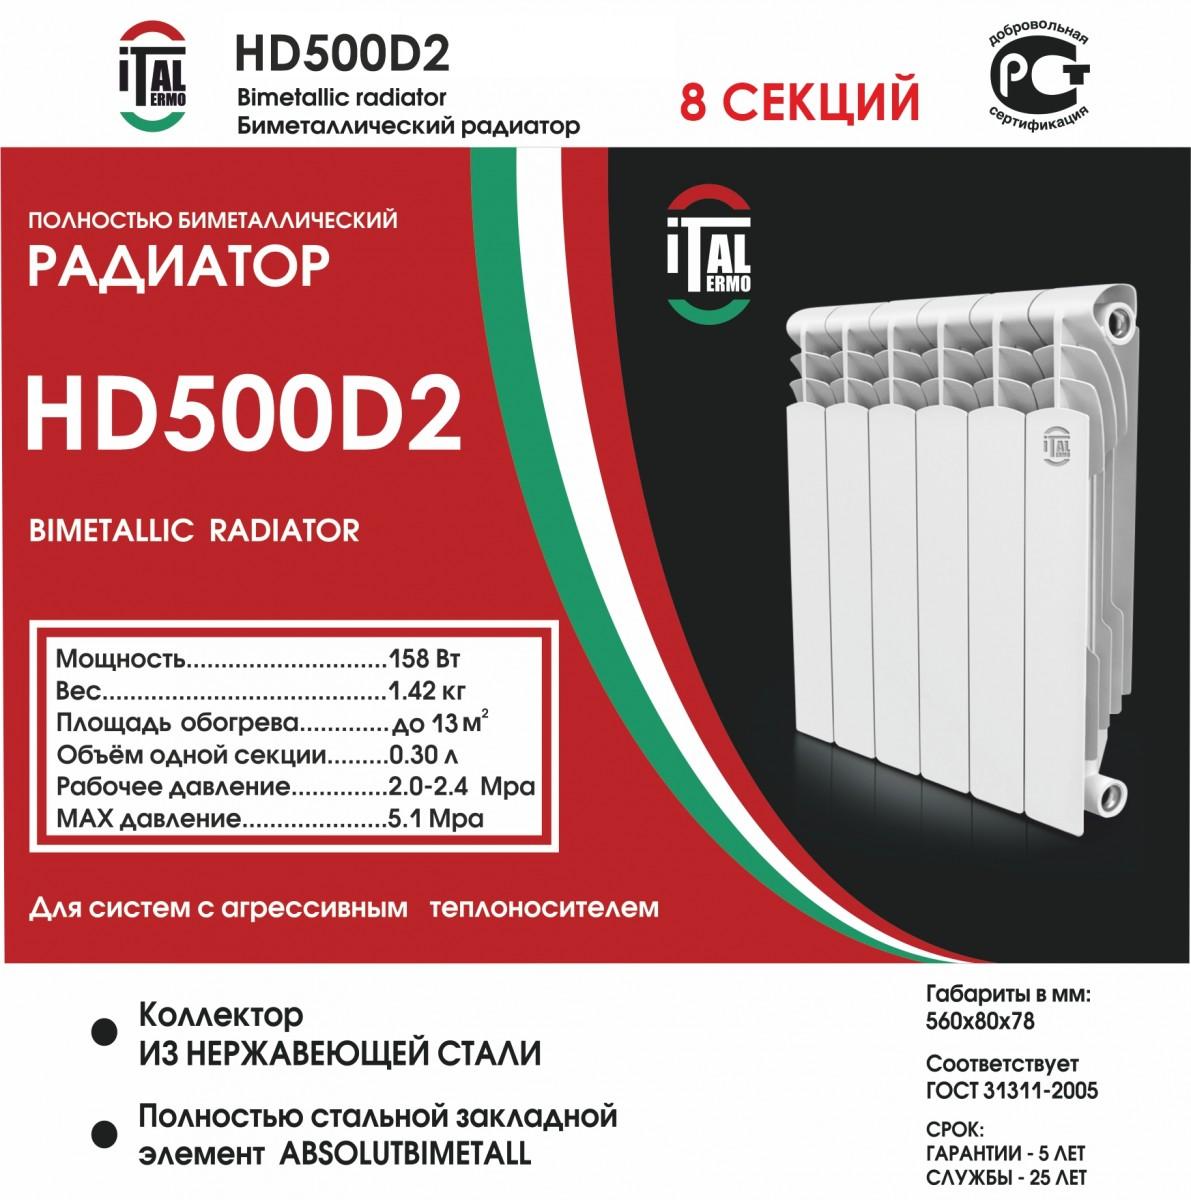 Радиатор ItalThermo HD500D2 Bimetallic 8 секций